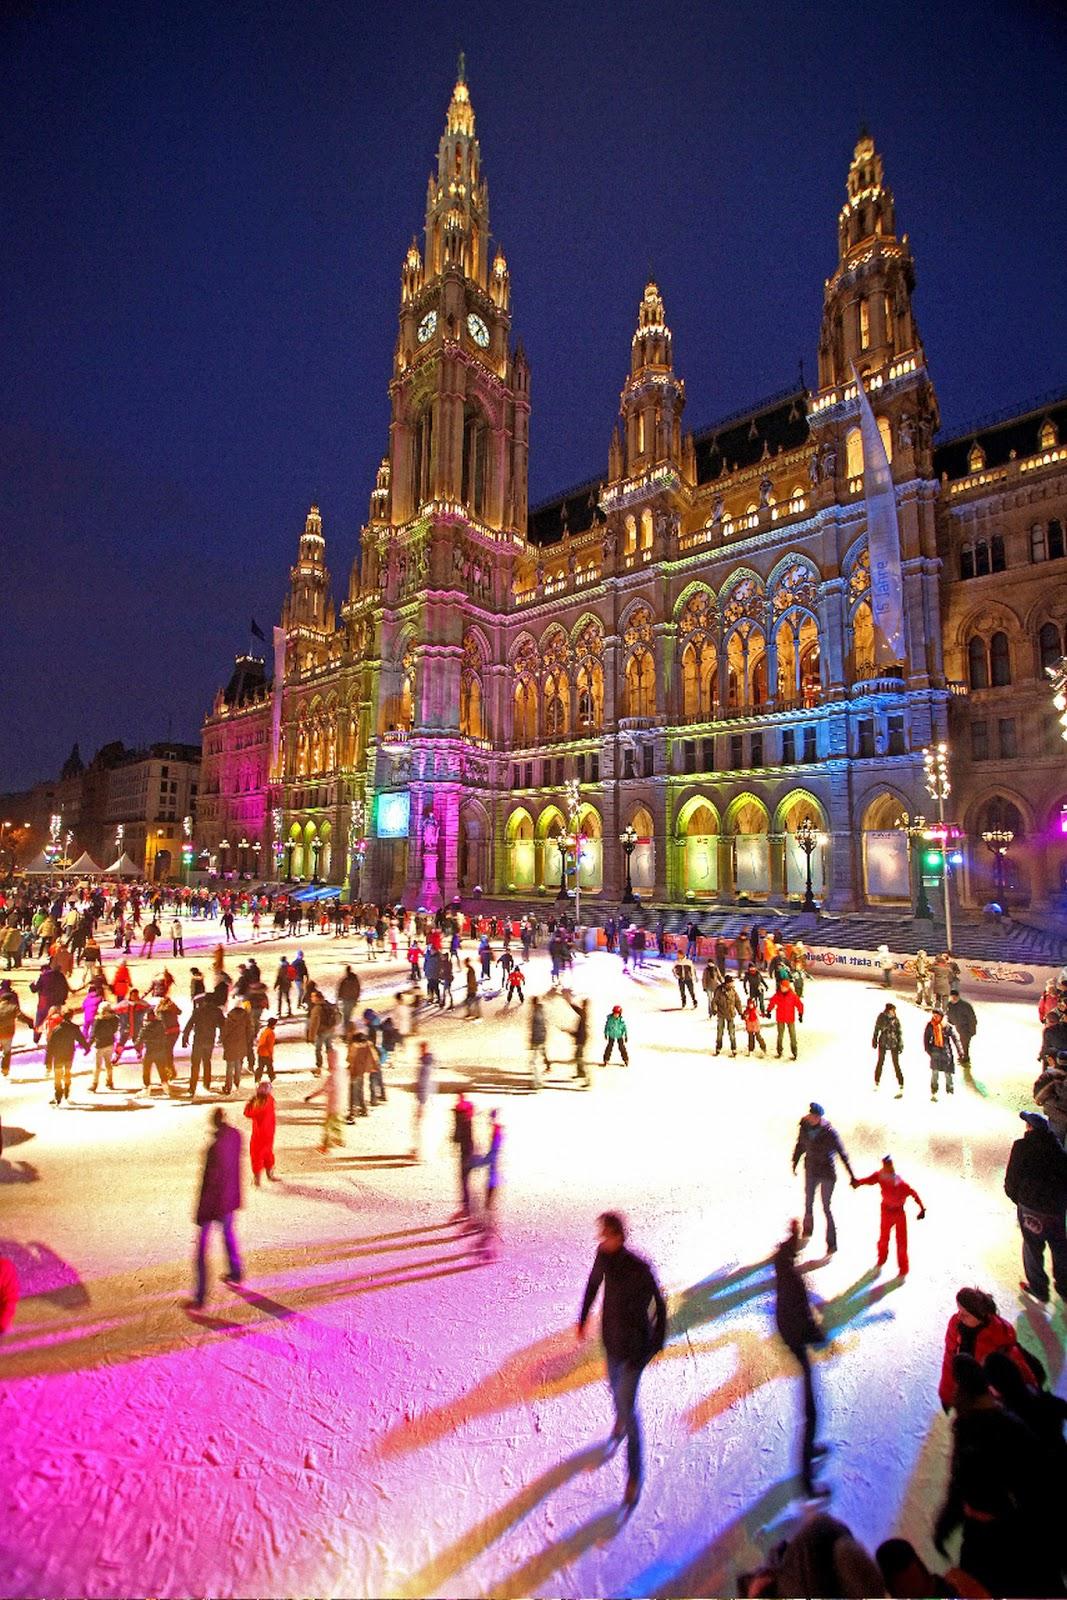 Idee per San Valentino 2015: pattianre al Wiener Eistraum di Vienna